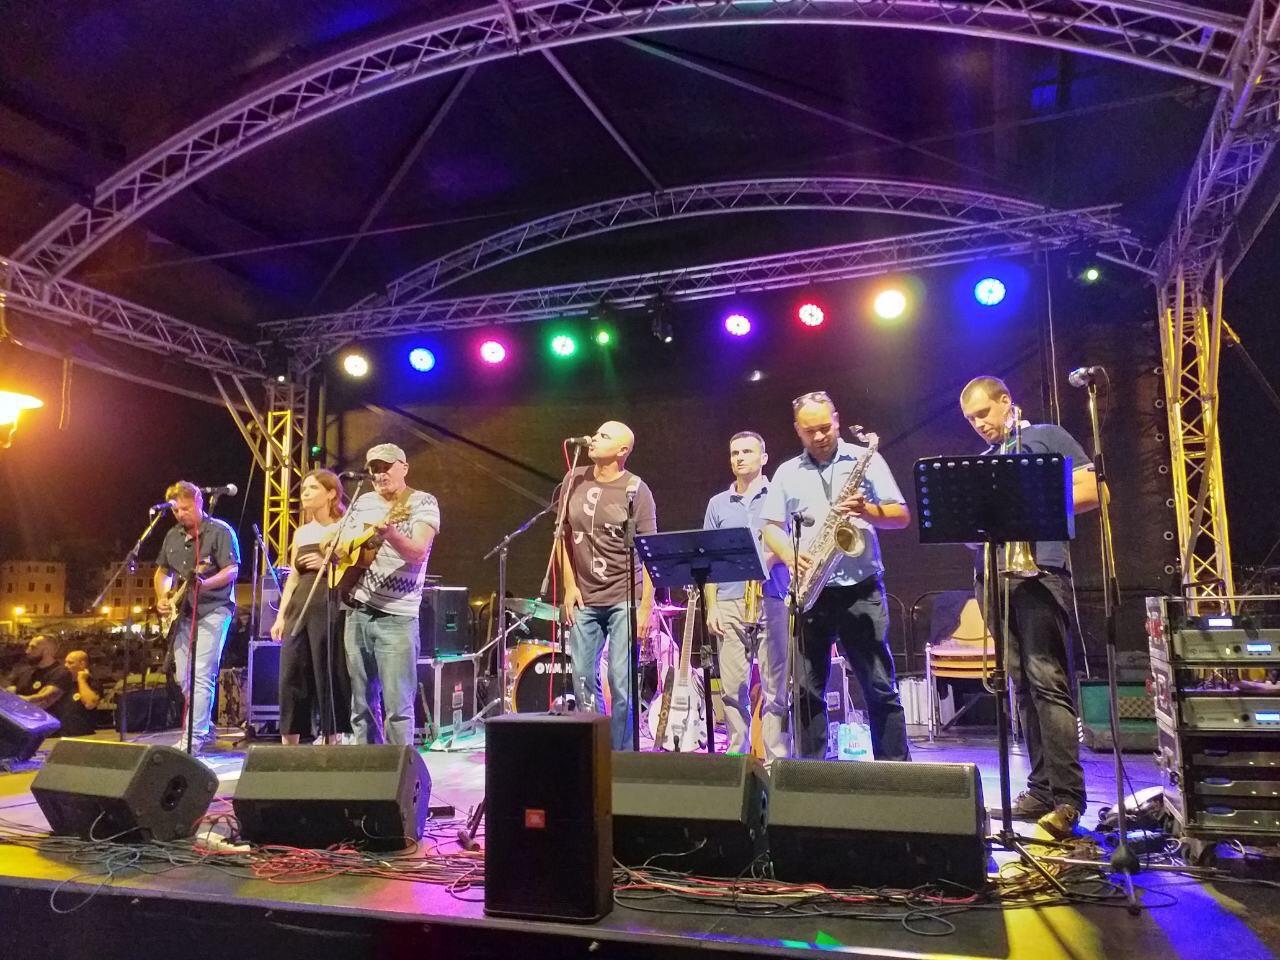 Il Festival Sete Sóis Sete Luas incanta Rovigno